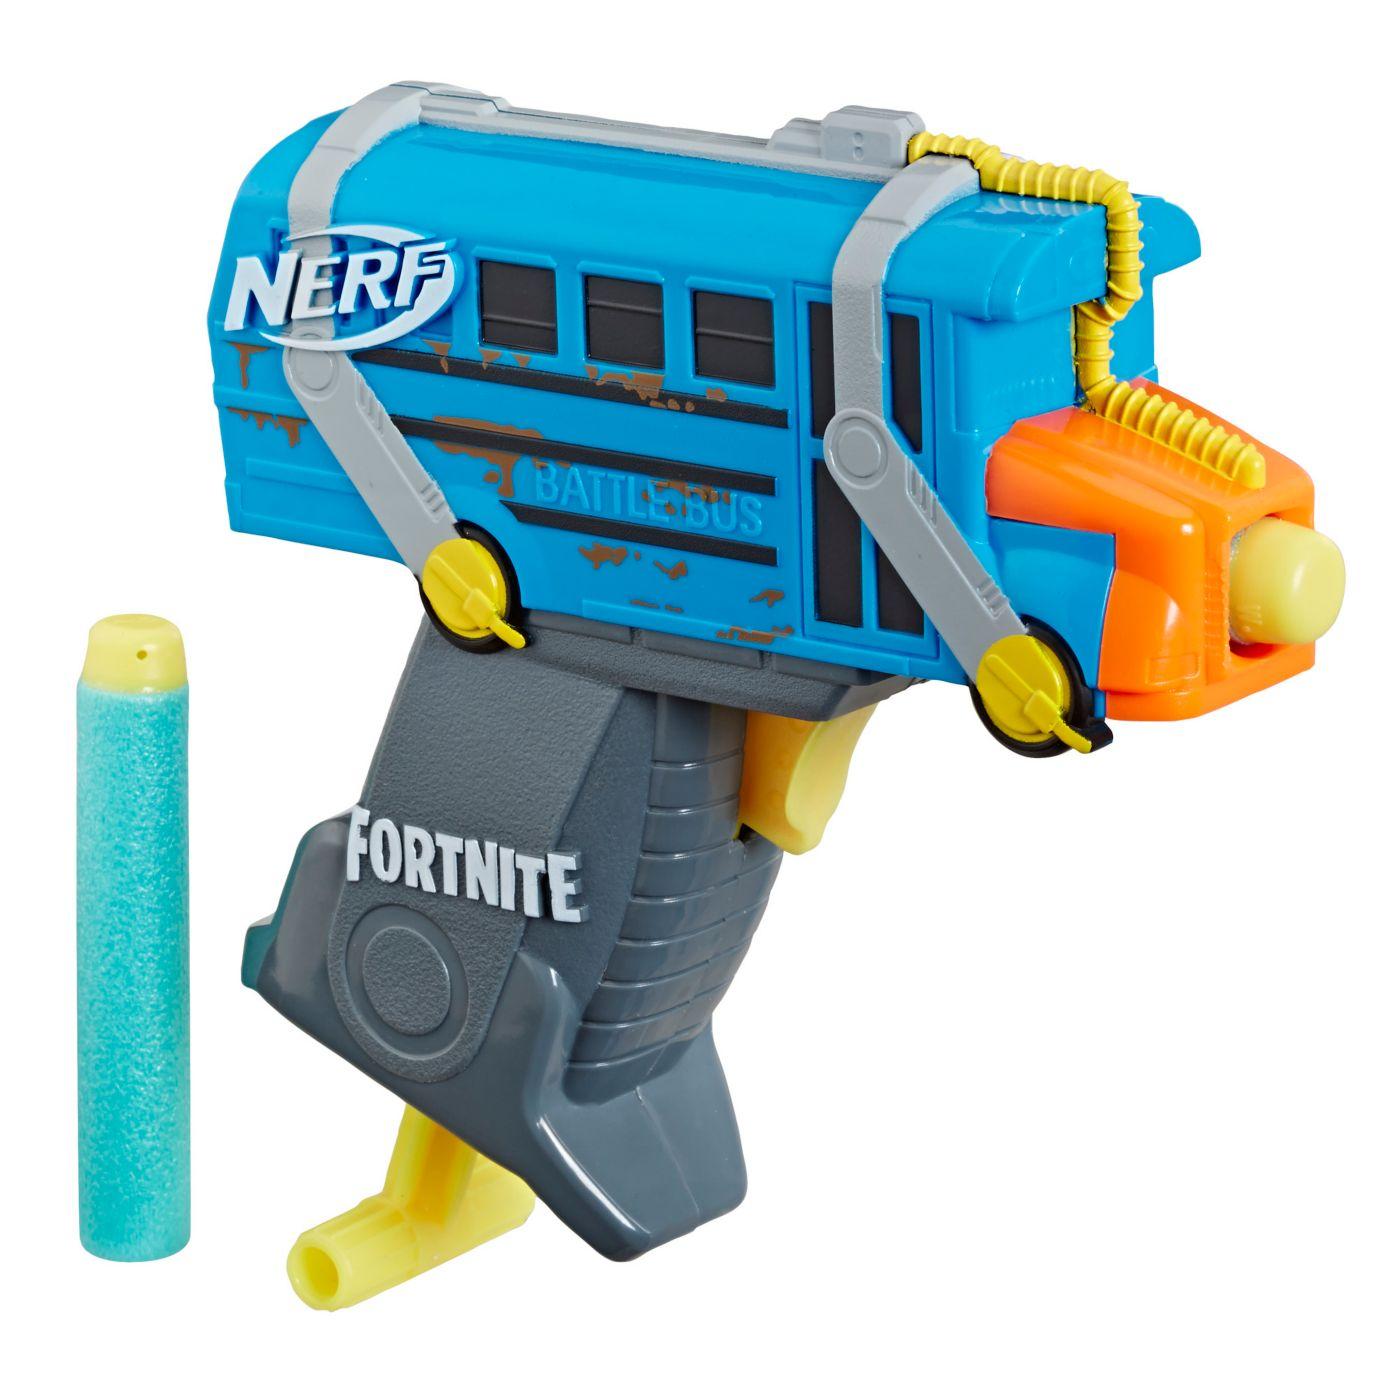 Nerf MicroShots Fortnite Bus Blaster